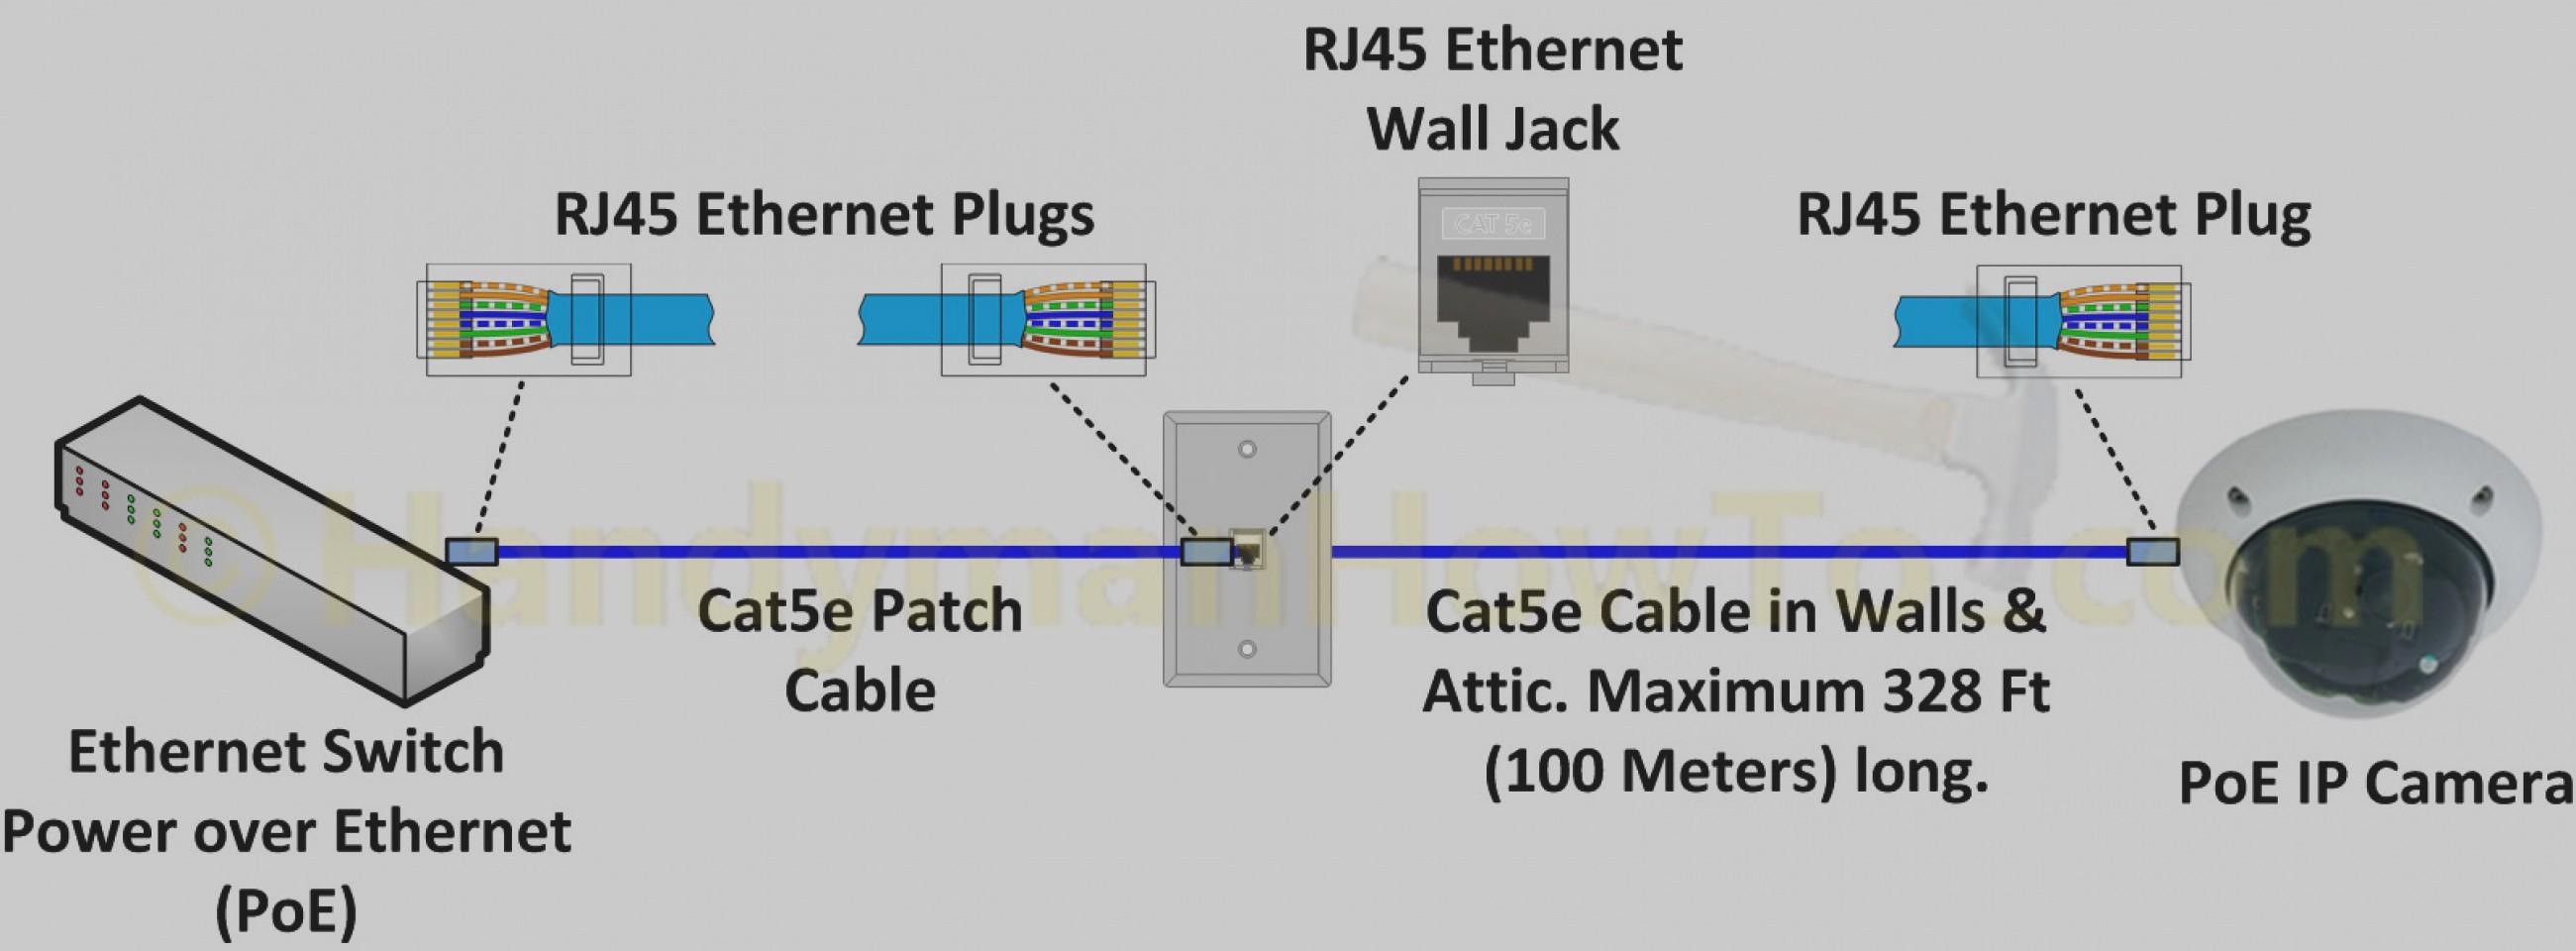 Rj45 Poe Wiring Diagram from i0.wp.com